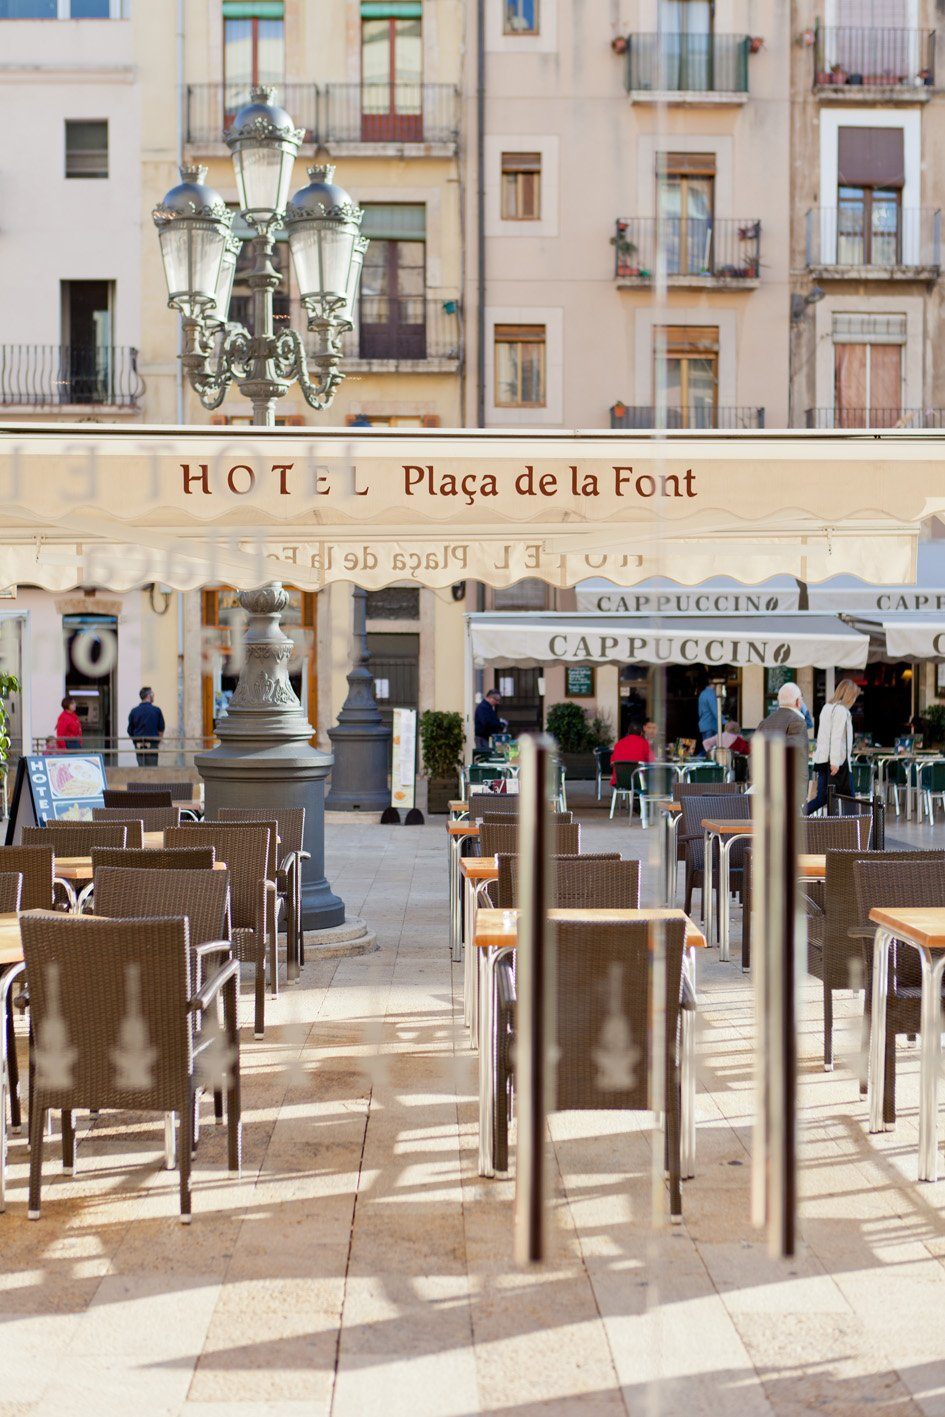 hotel_la_fontnombre_del_documento_21-897ea98bbe2d2a2adb8a93b2aa840c64